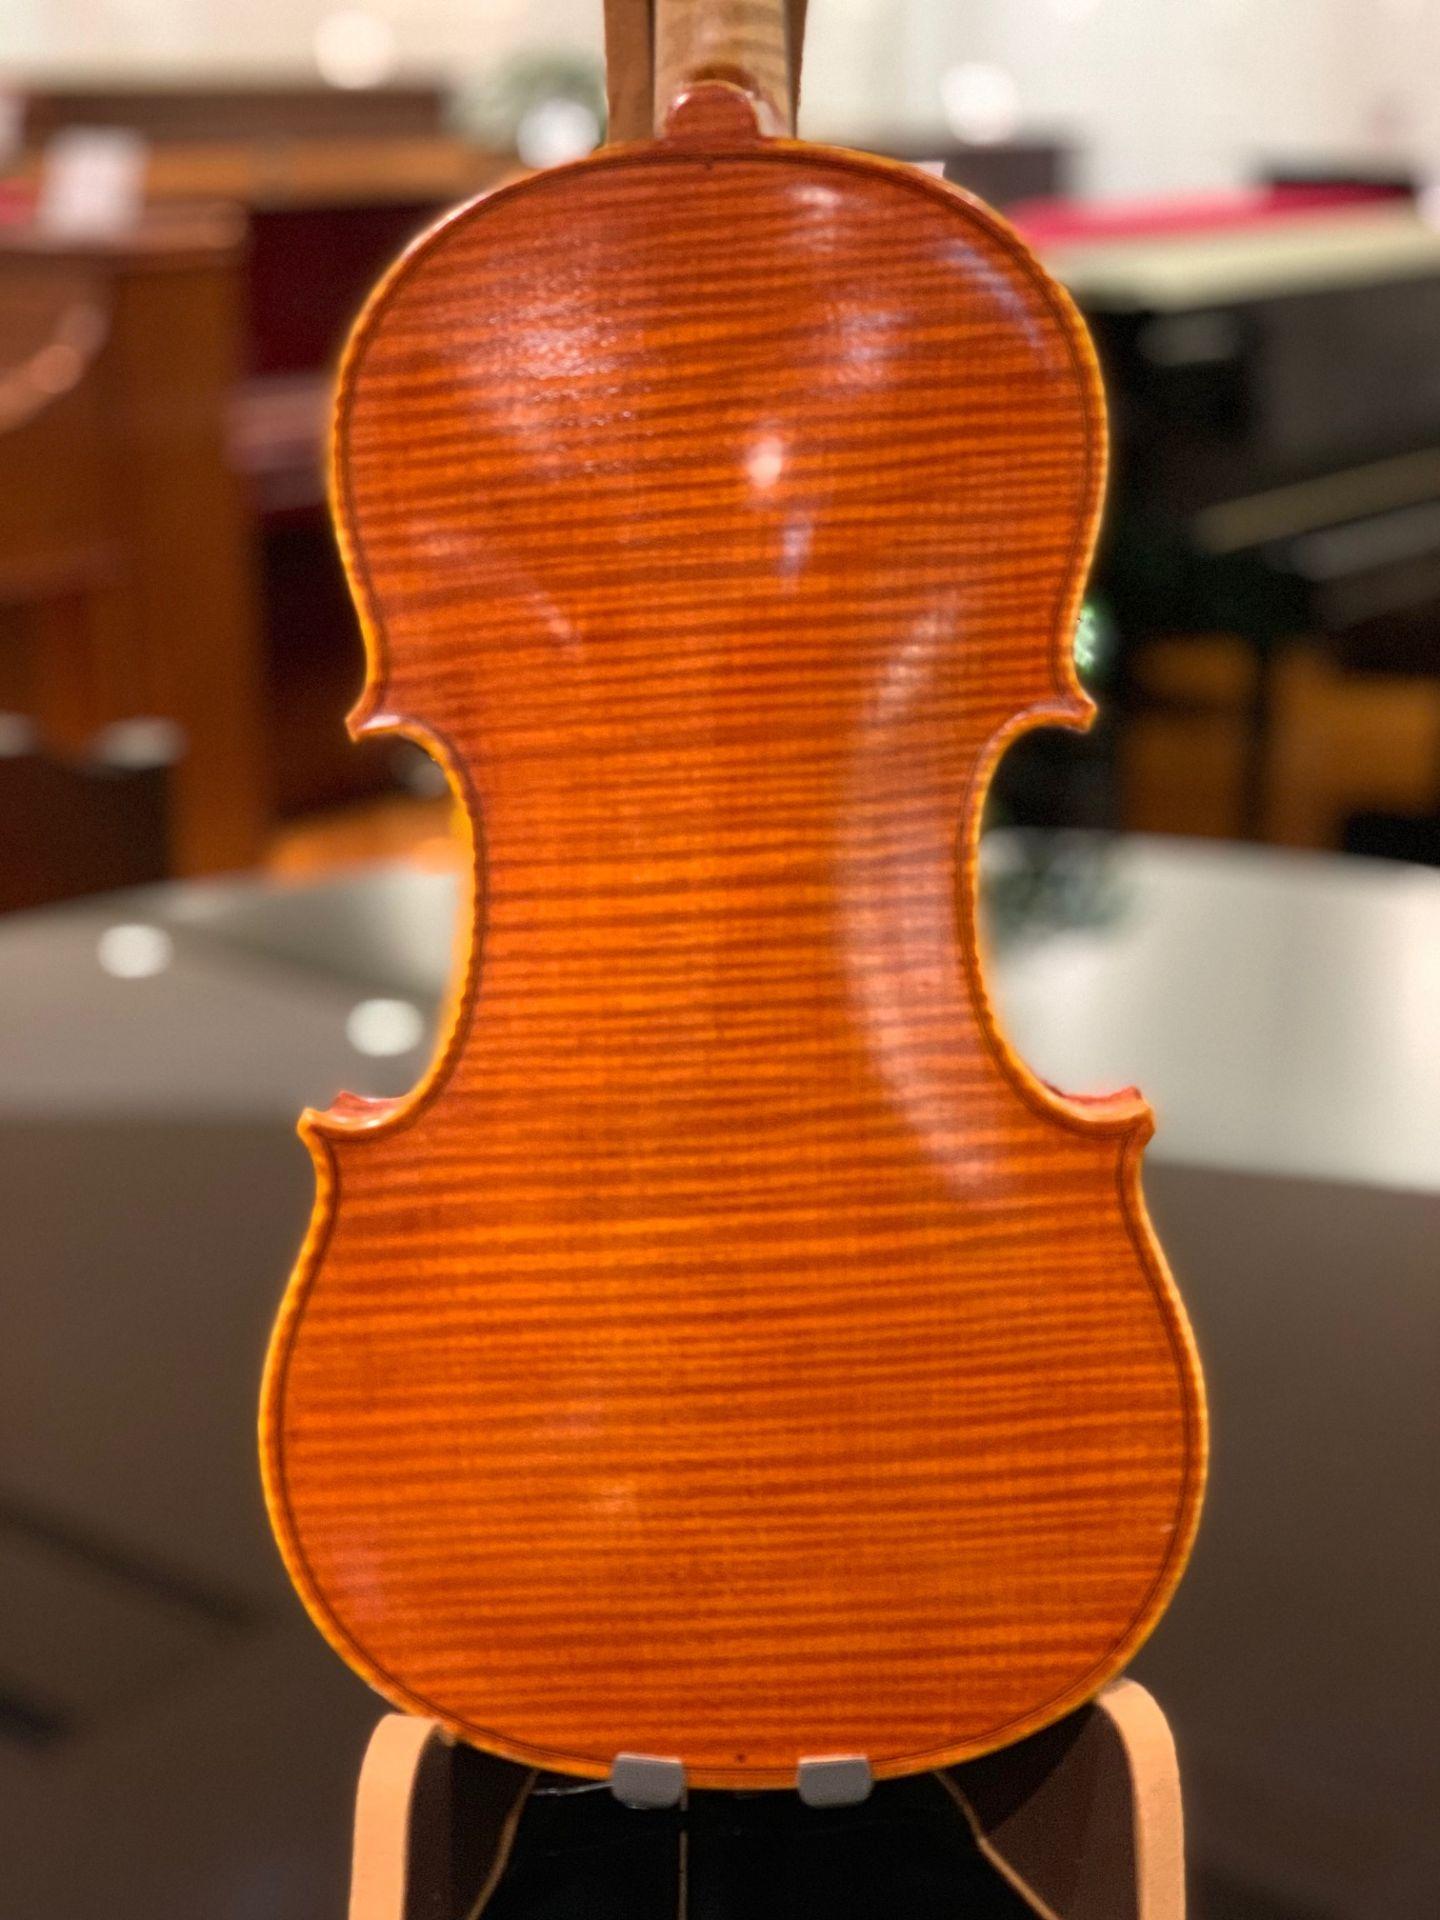 A.Schudtz/2018 バイオリン入荷しました 島村楽器みなとみらい店